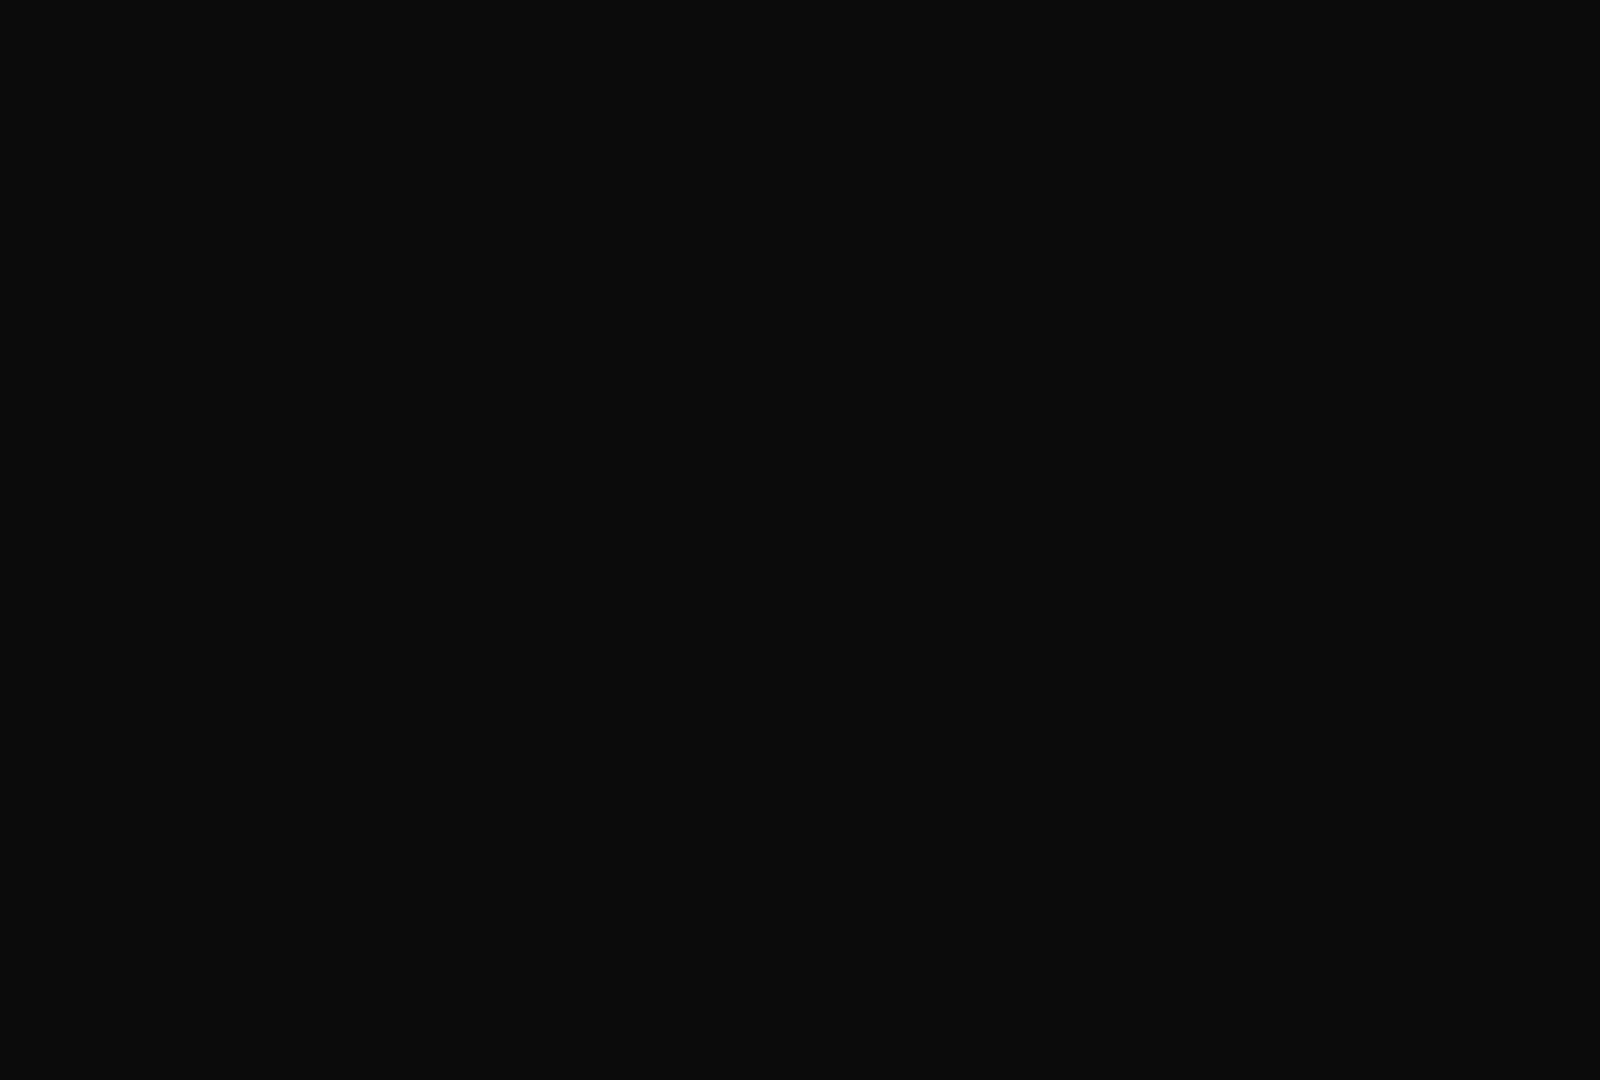 充血監督の深夜の運動会Vol.74 熟女  94枚 45